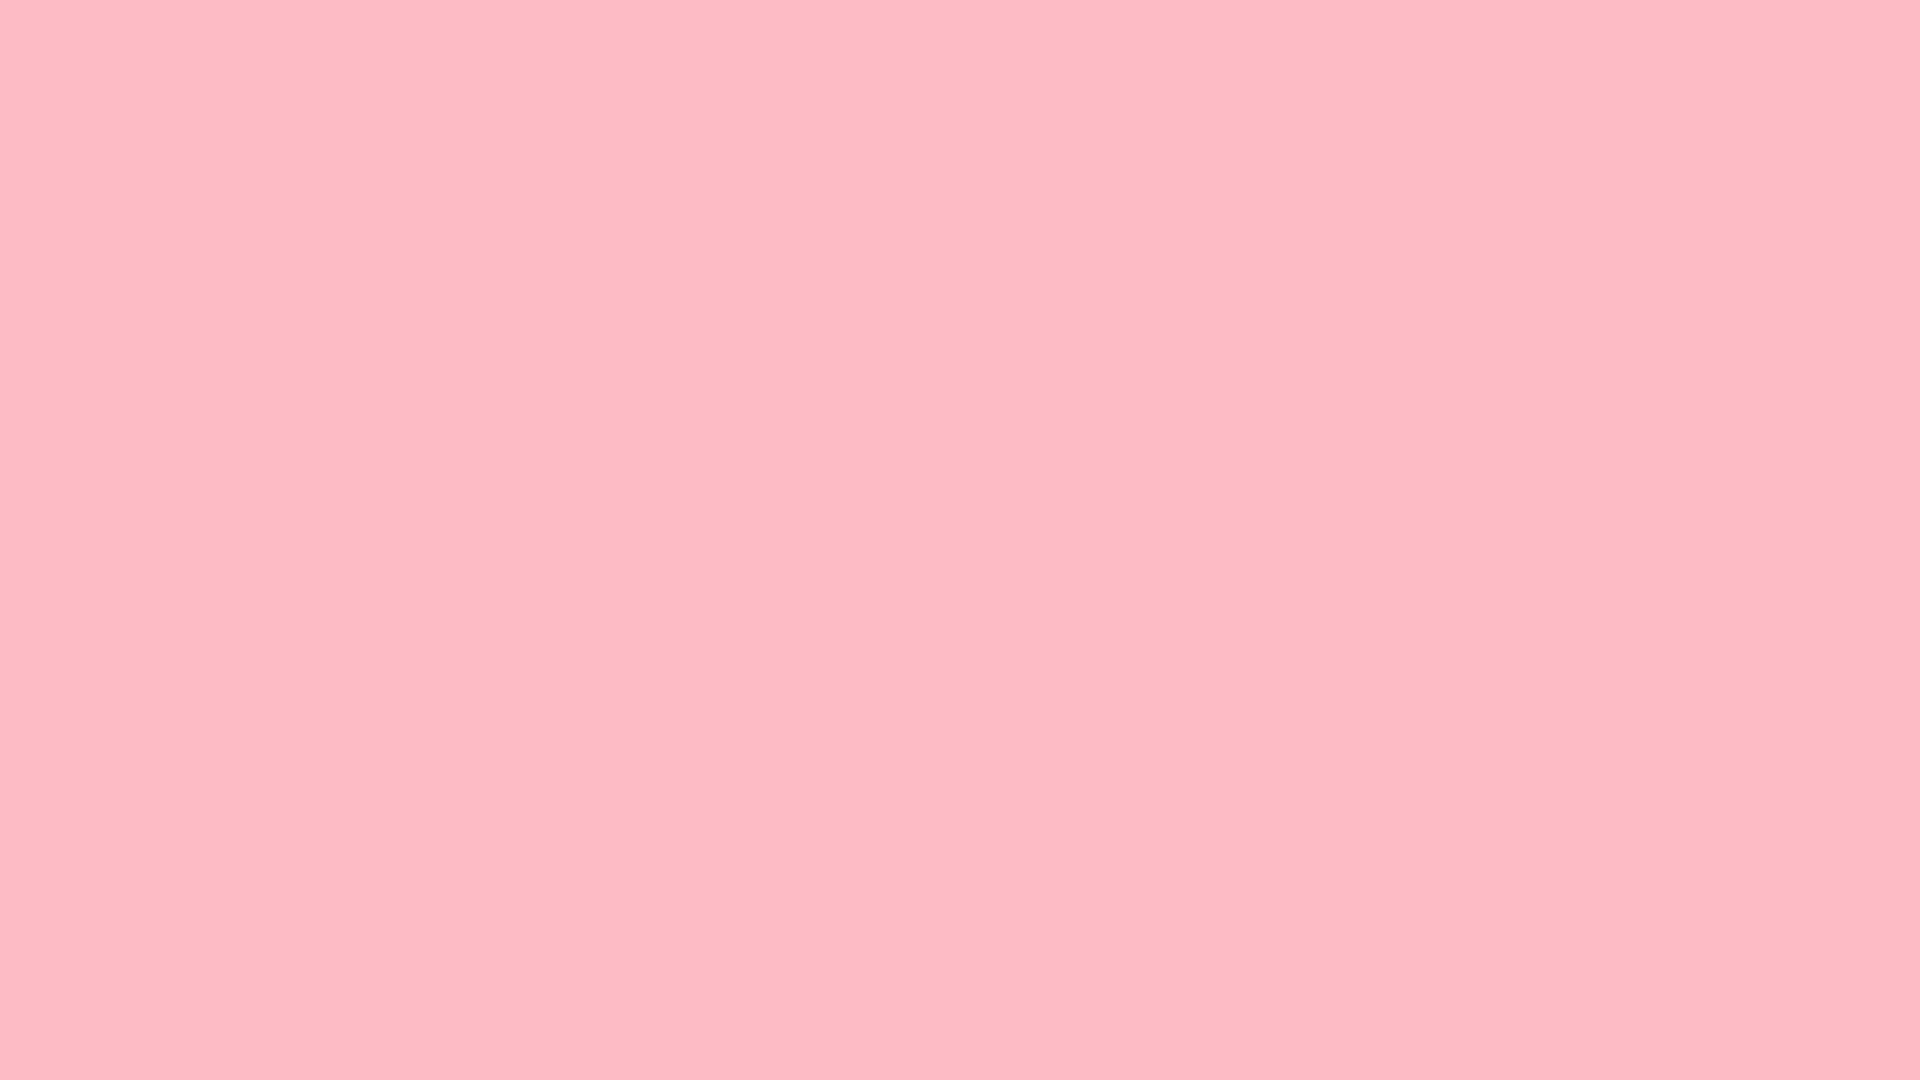 Blush Pink Wallpapers - Wallpaper Cave